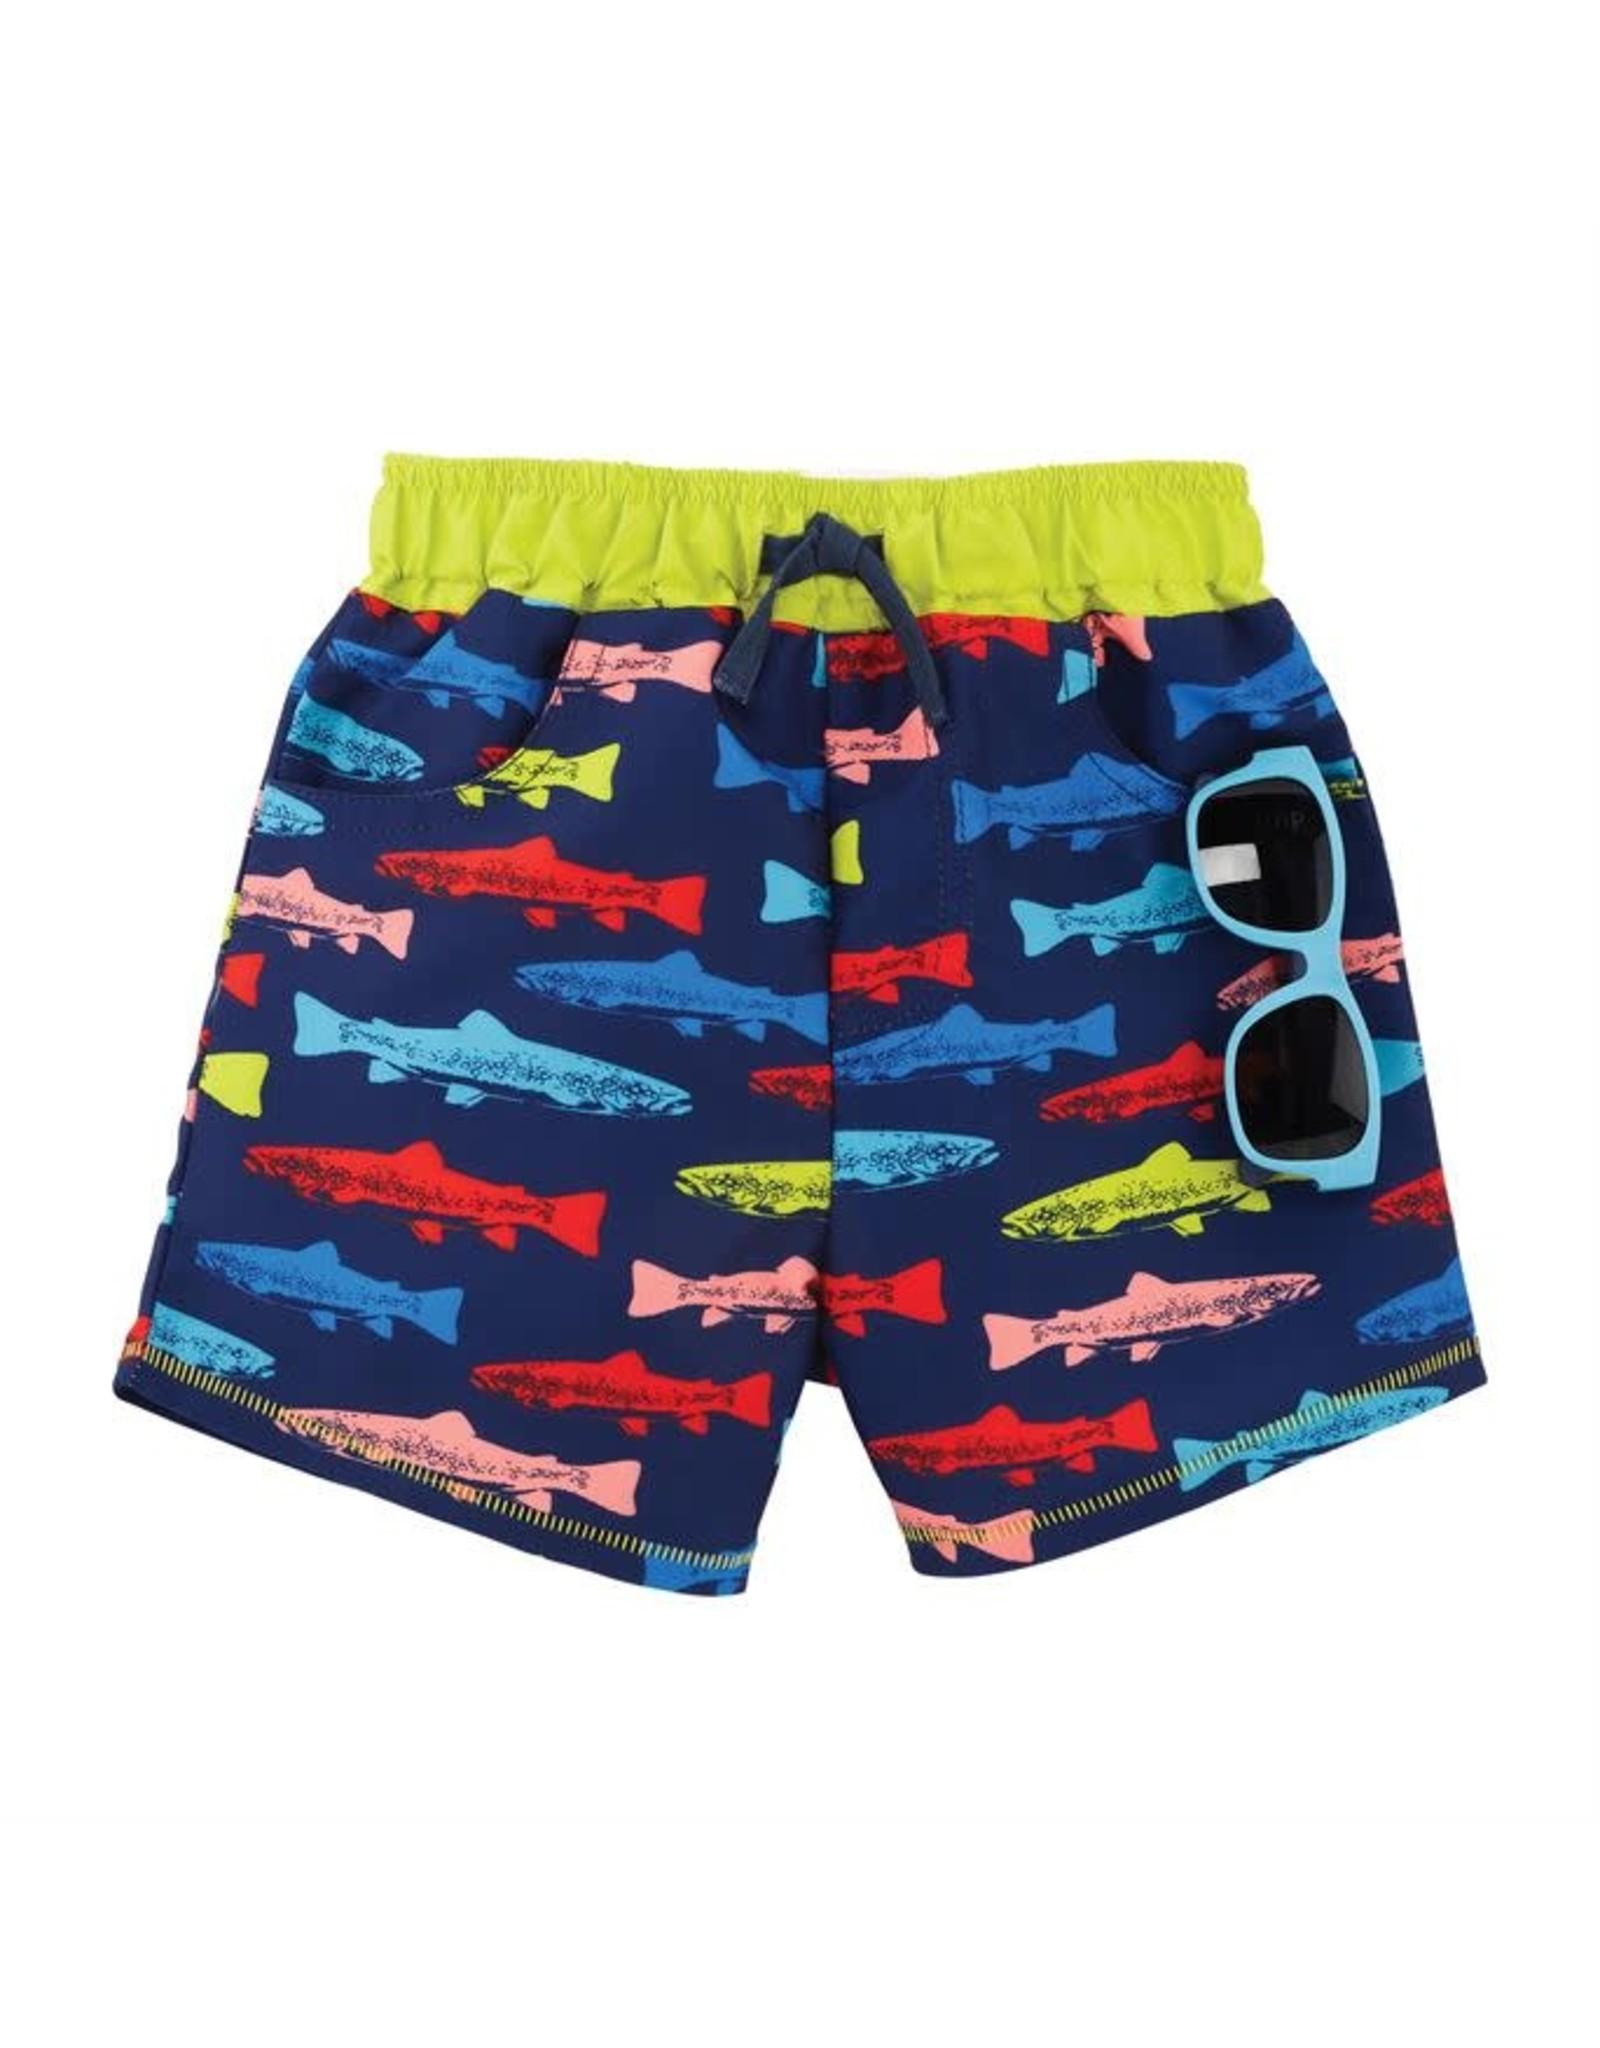 Mudpie Mud Pie- Fish Swim Trunks w/Sunglasses